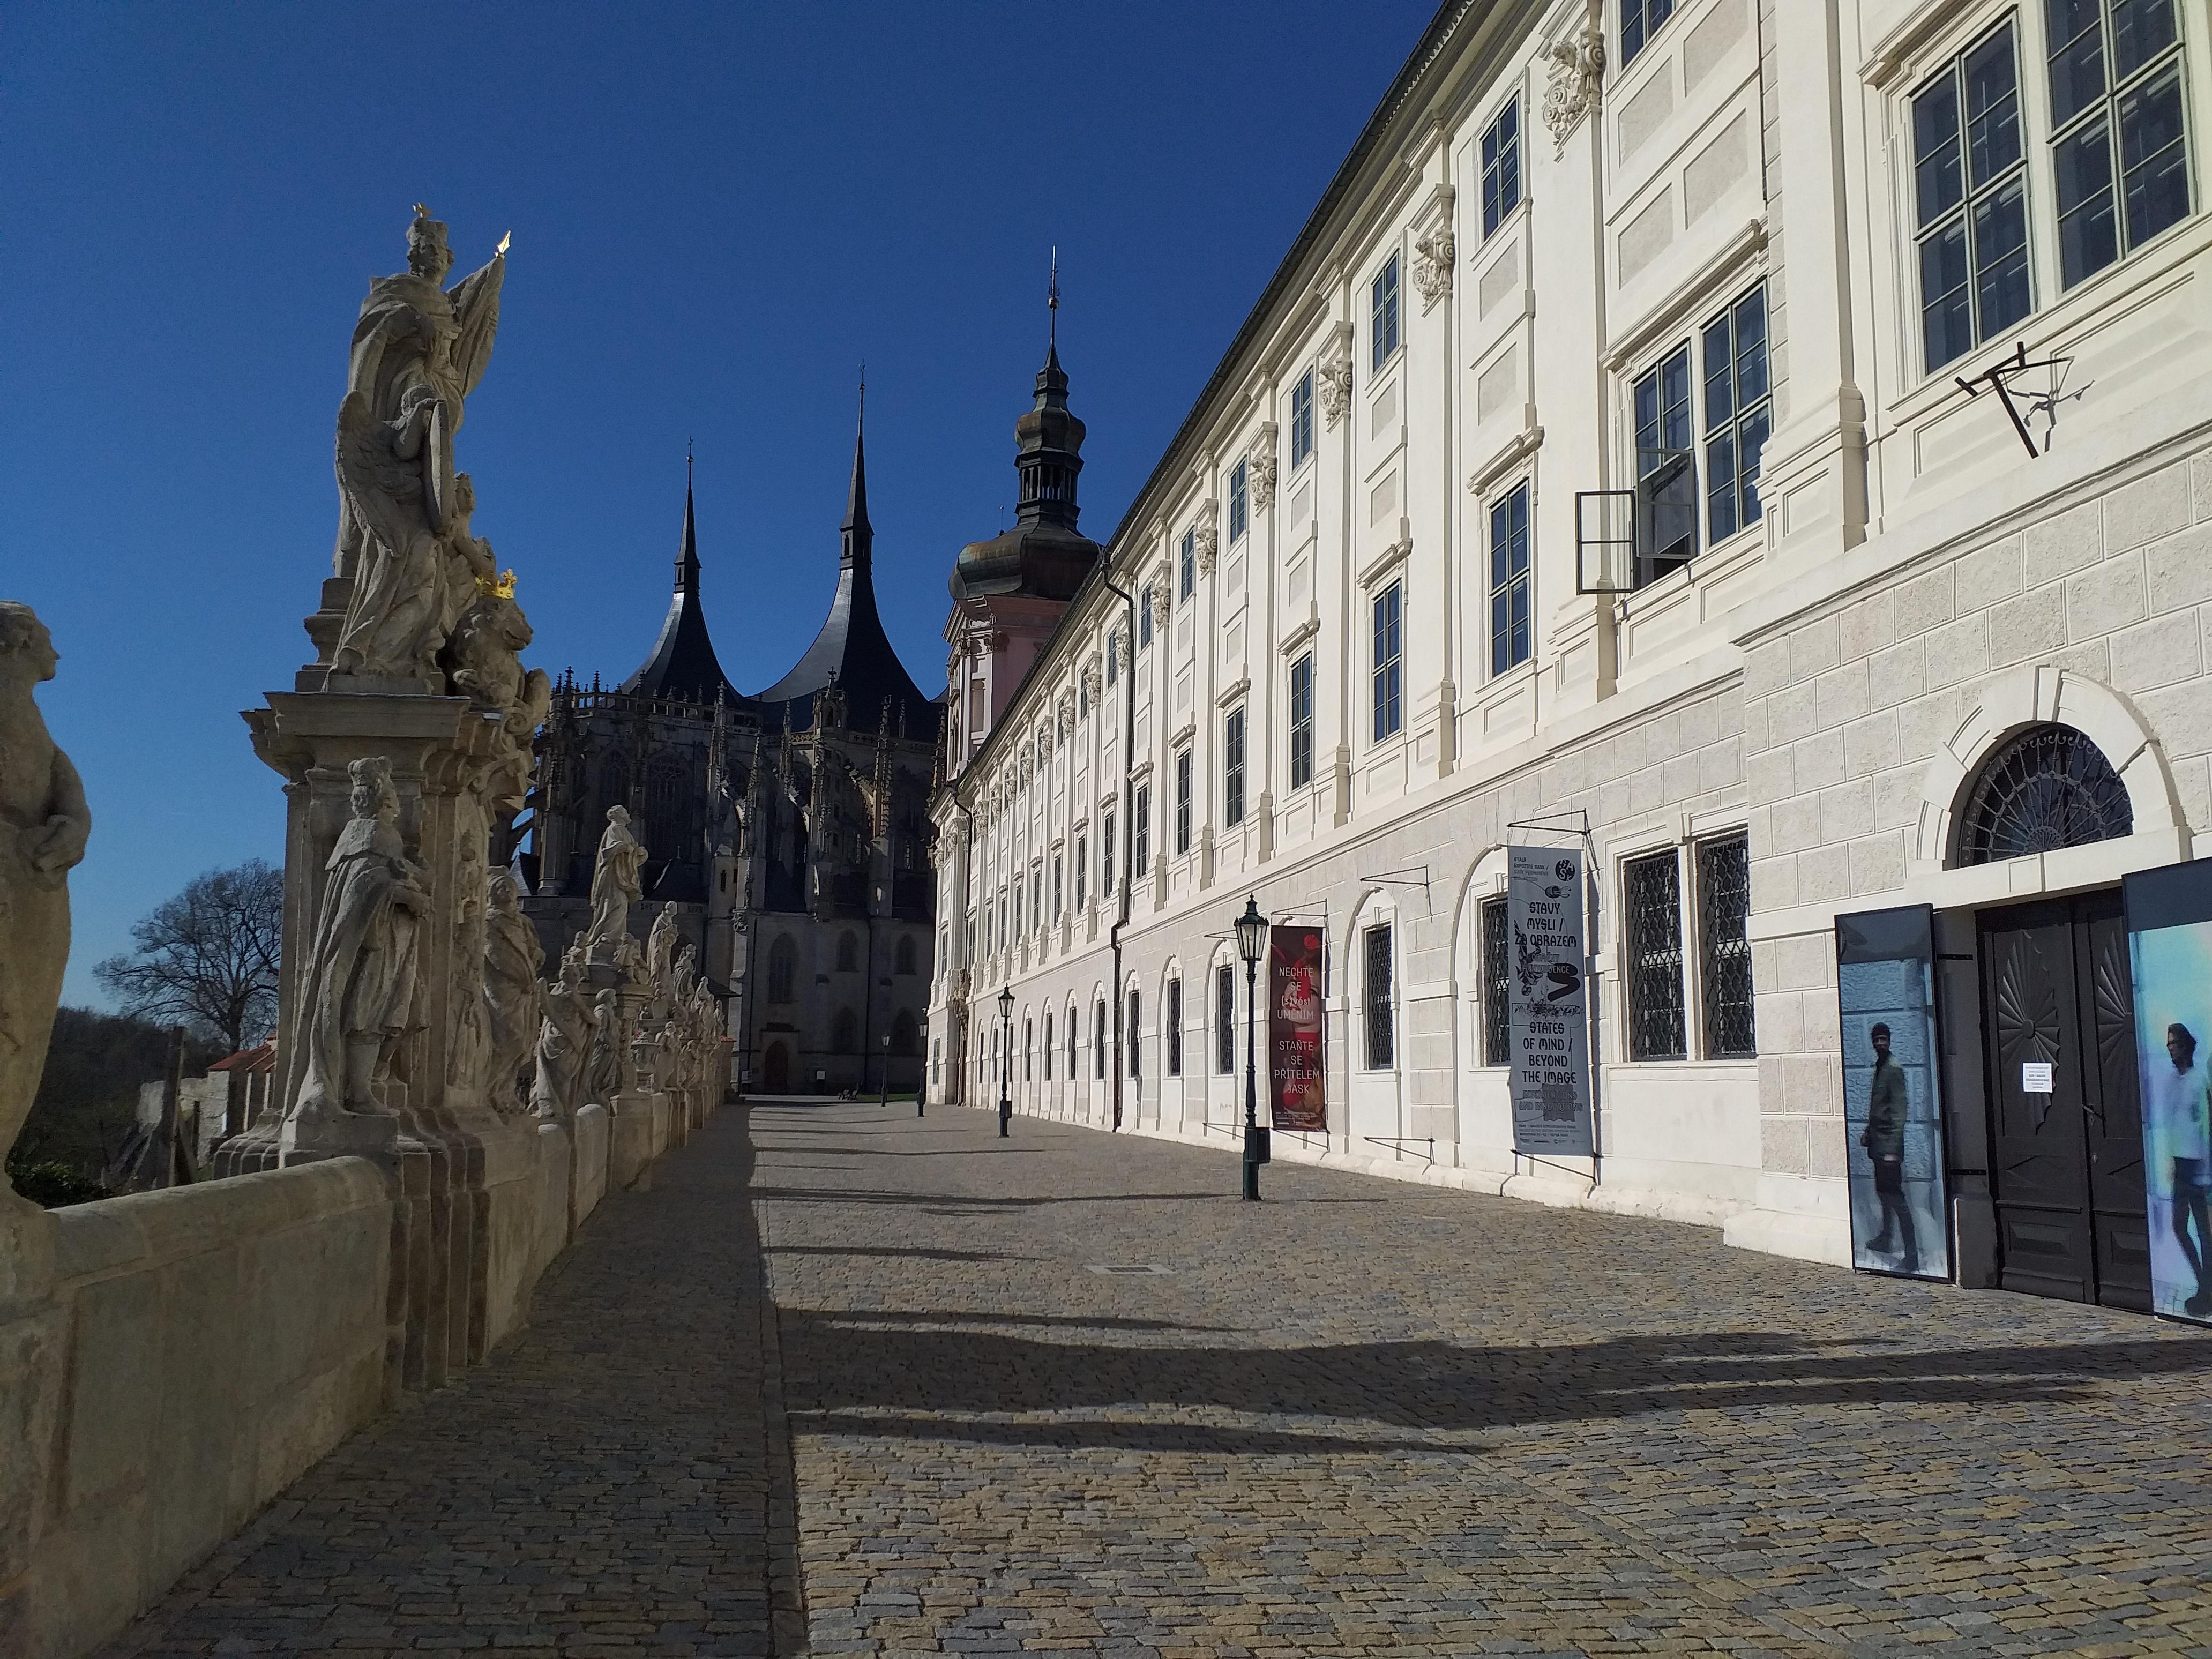 20414-chram-sv-barbory-a-jezuitska-kolej-st-barbara-s-cathedral-and-jesuit-college-3.jpg